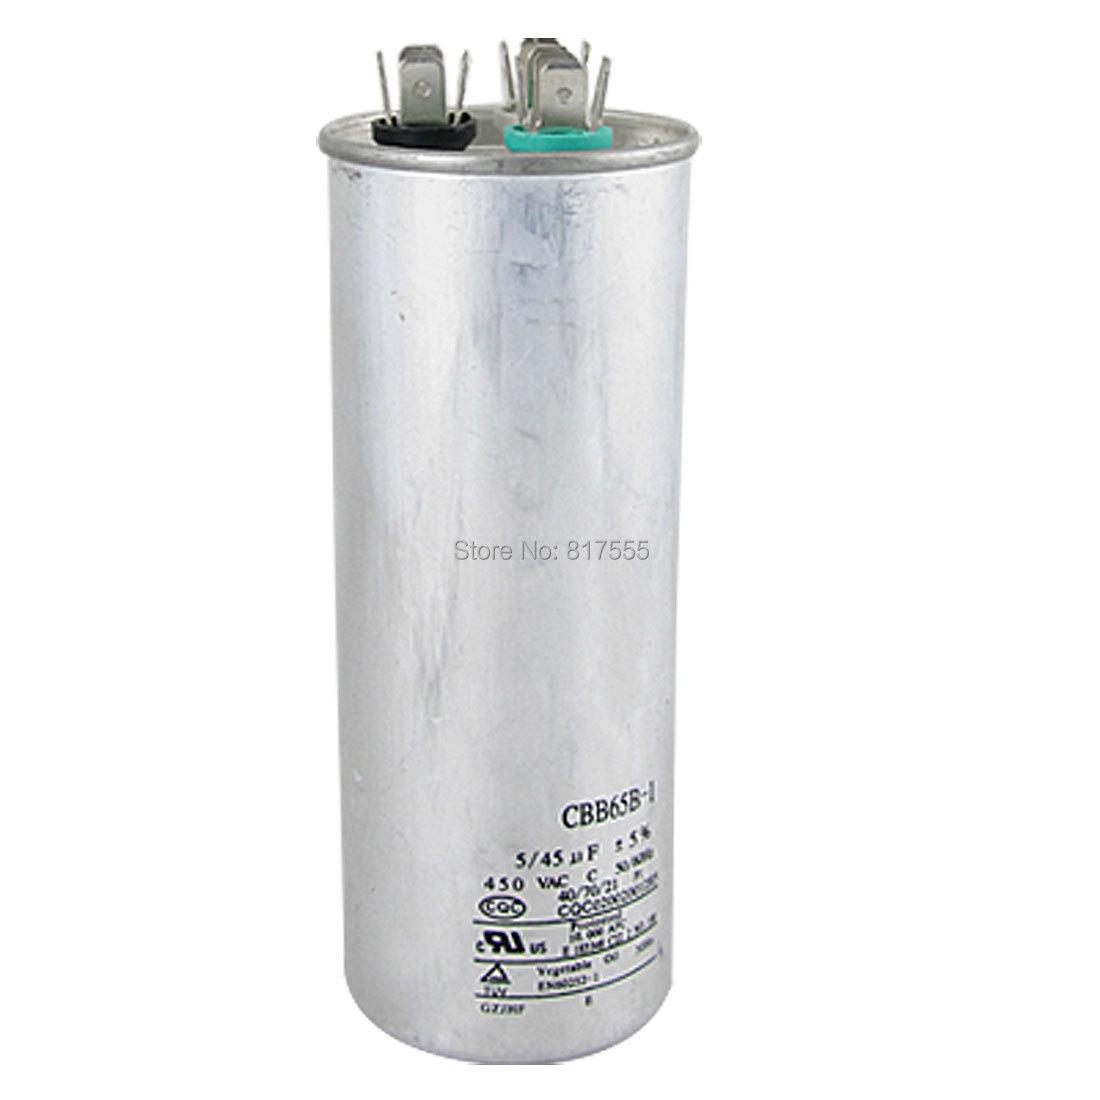 air conditioner wiring diagram capacitor led dimming ballast moreover start run motor hard